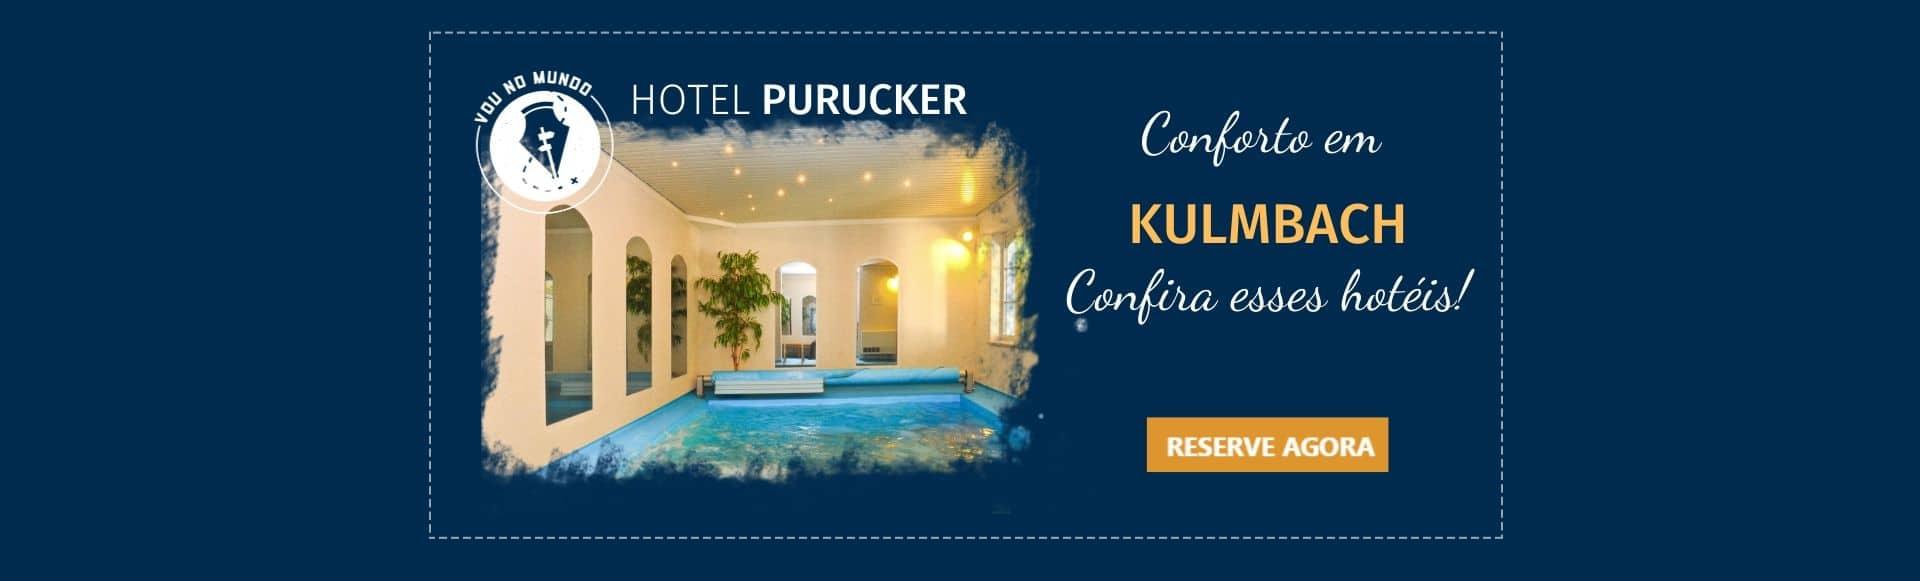 Hotel Purucker em Kulmbach, Alemanha.